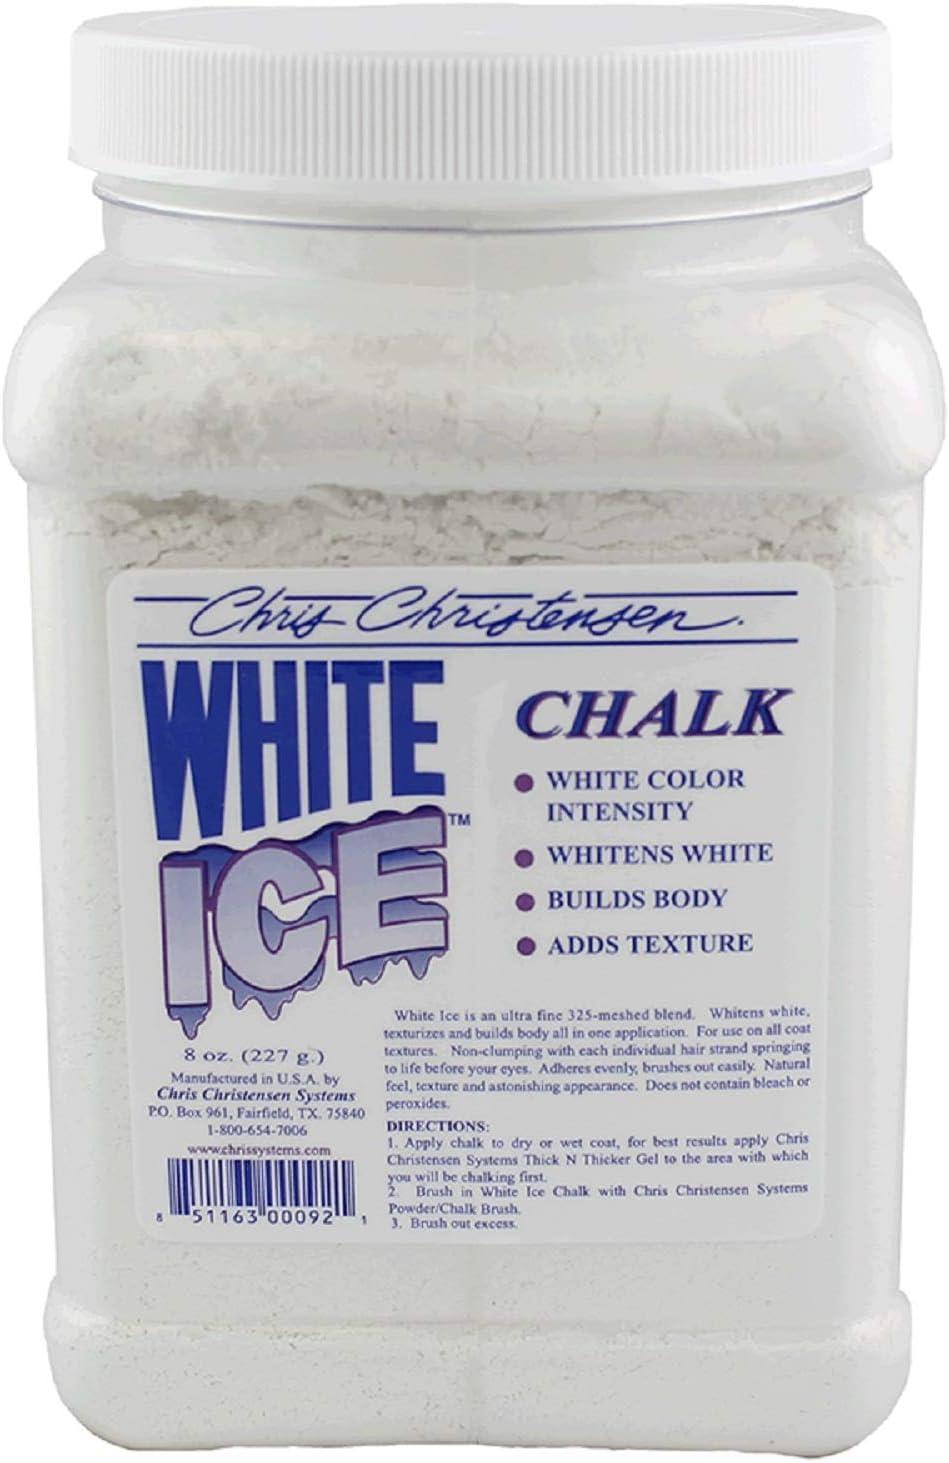 Beauty products cheap Chris Christensen White Chalk Ice 22oz